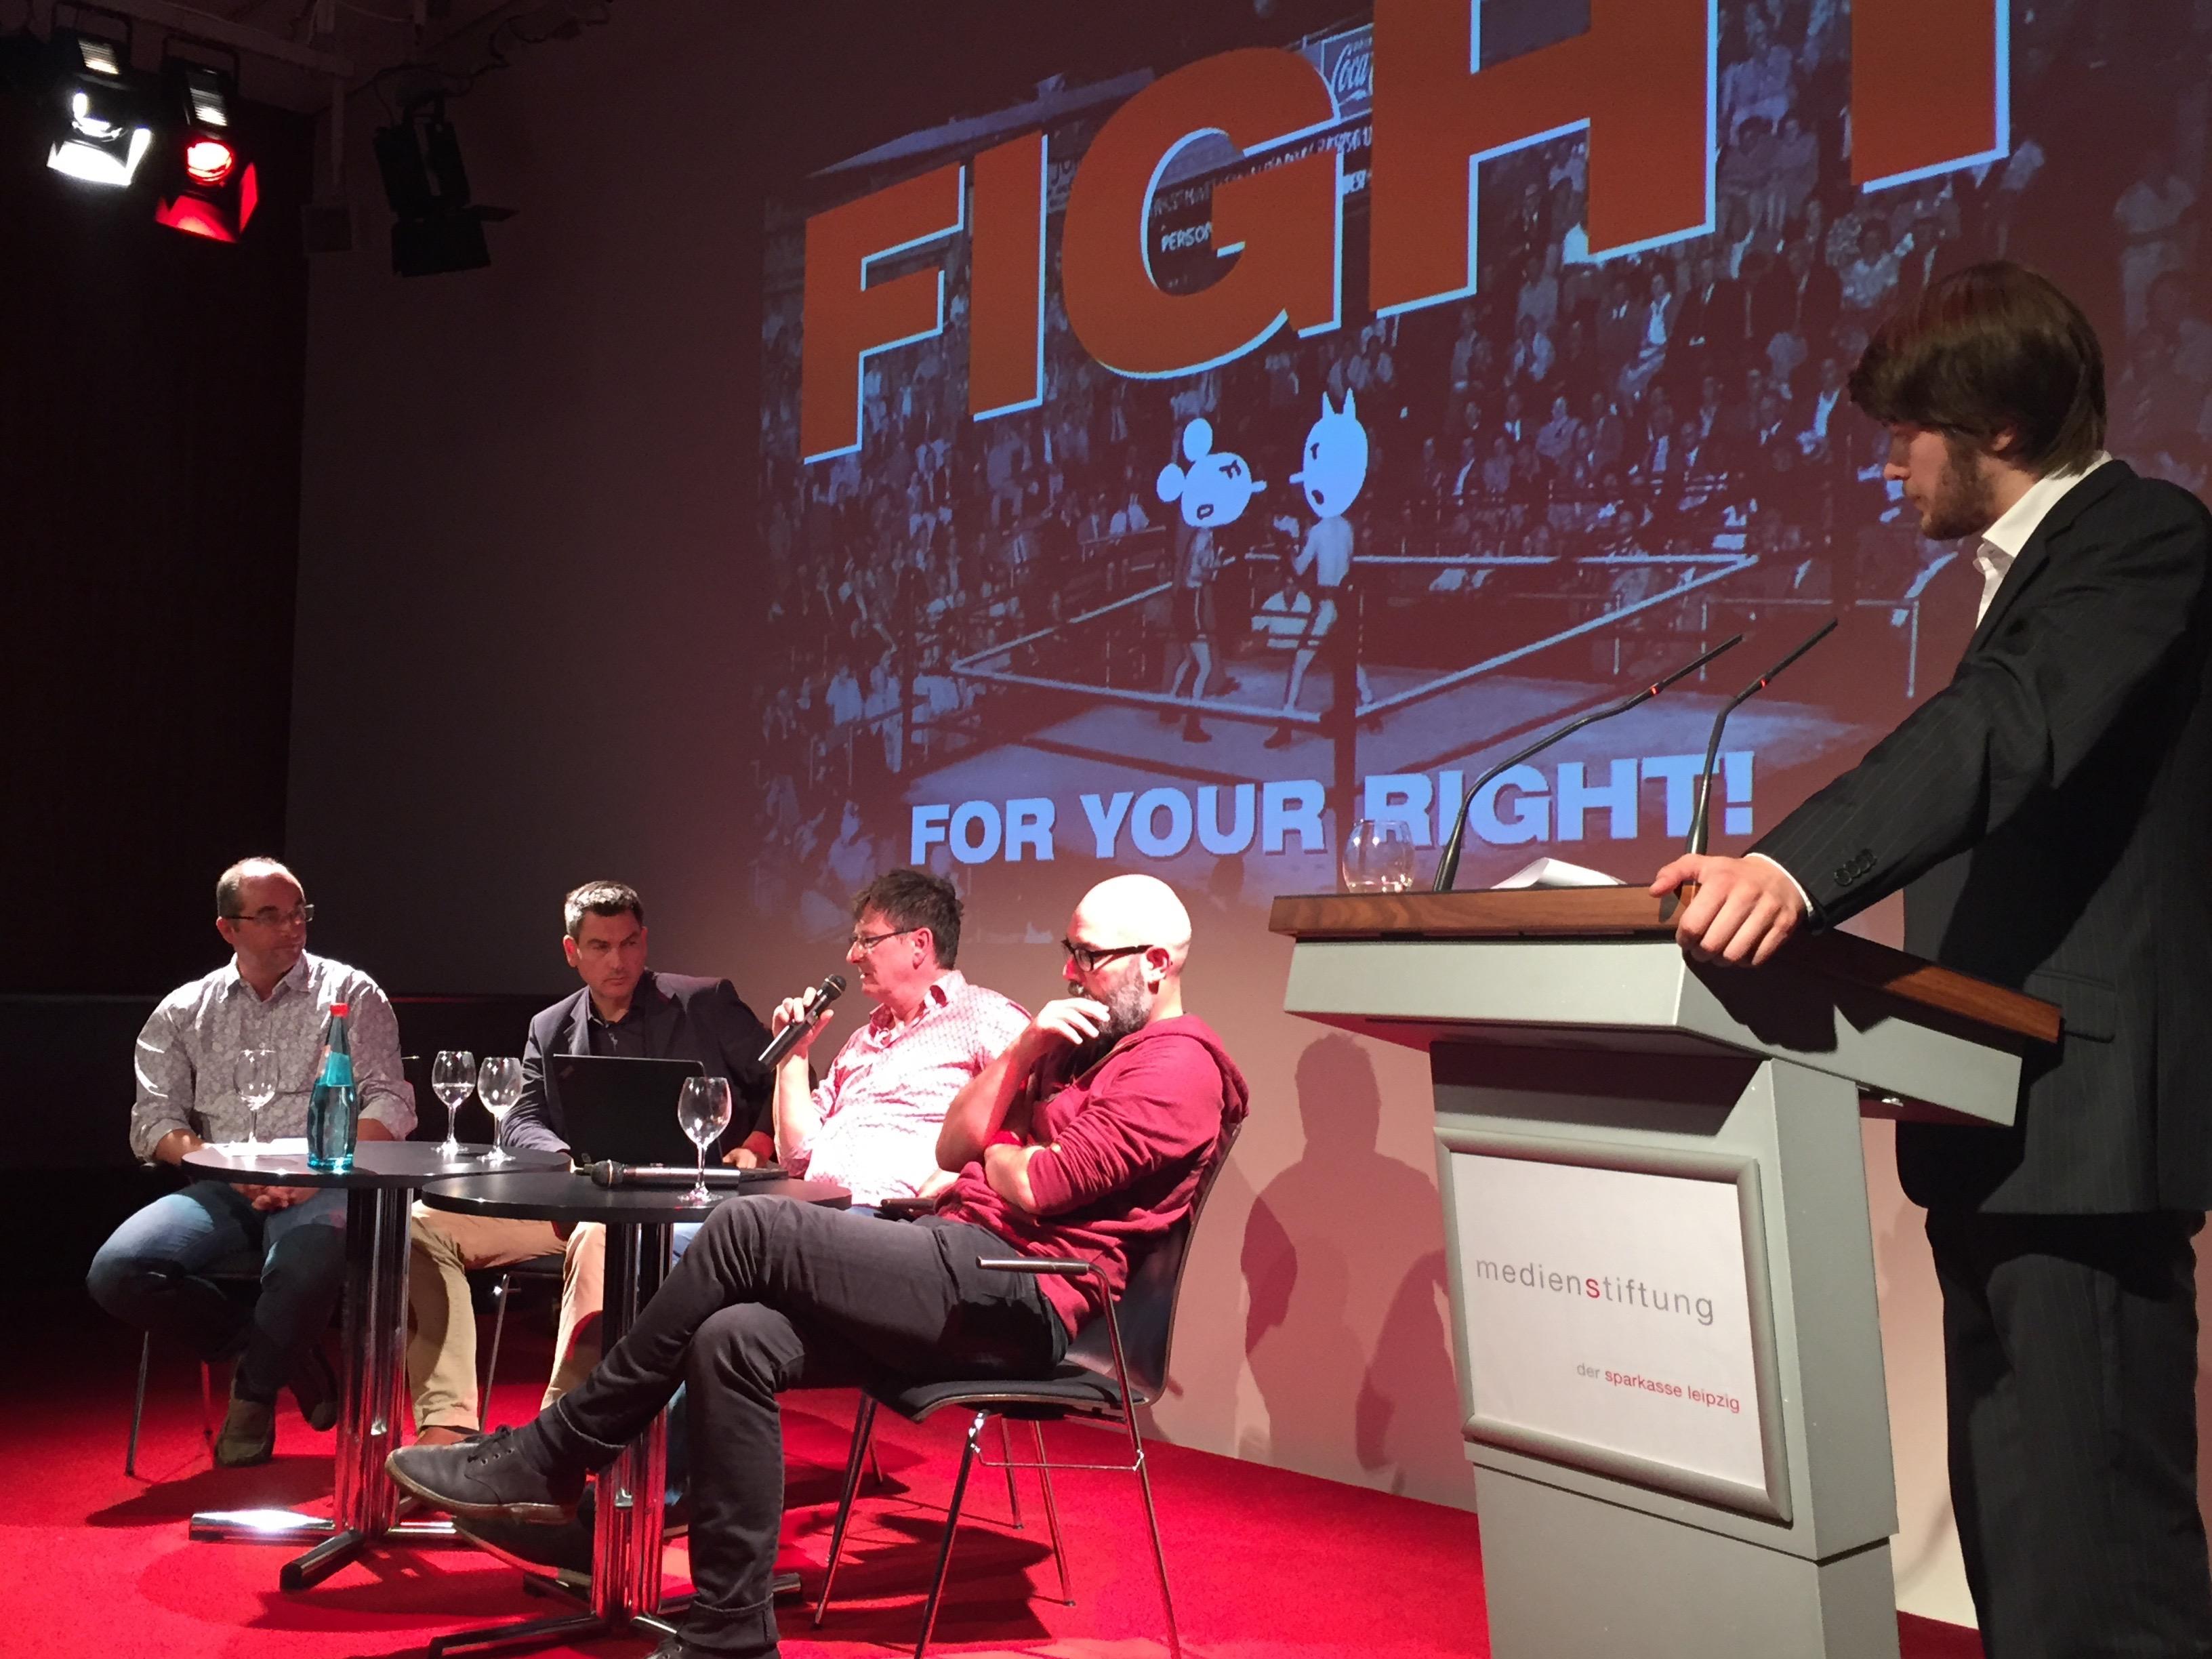 Fight for Your Right alle Podcasts zum Nachhören